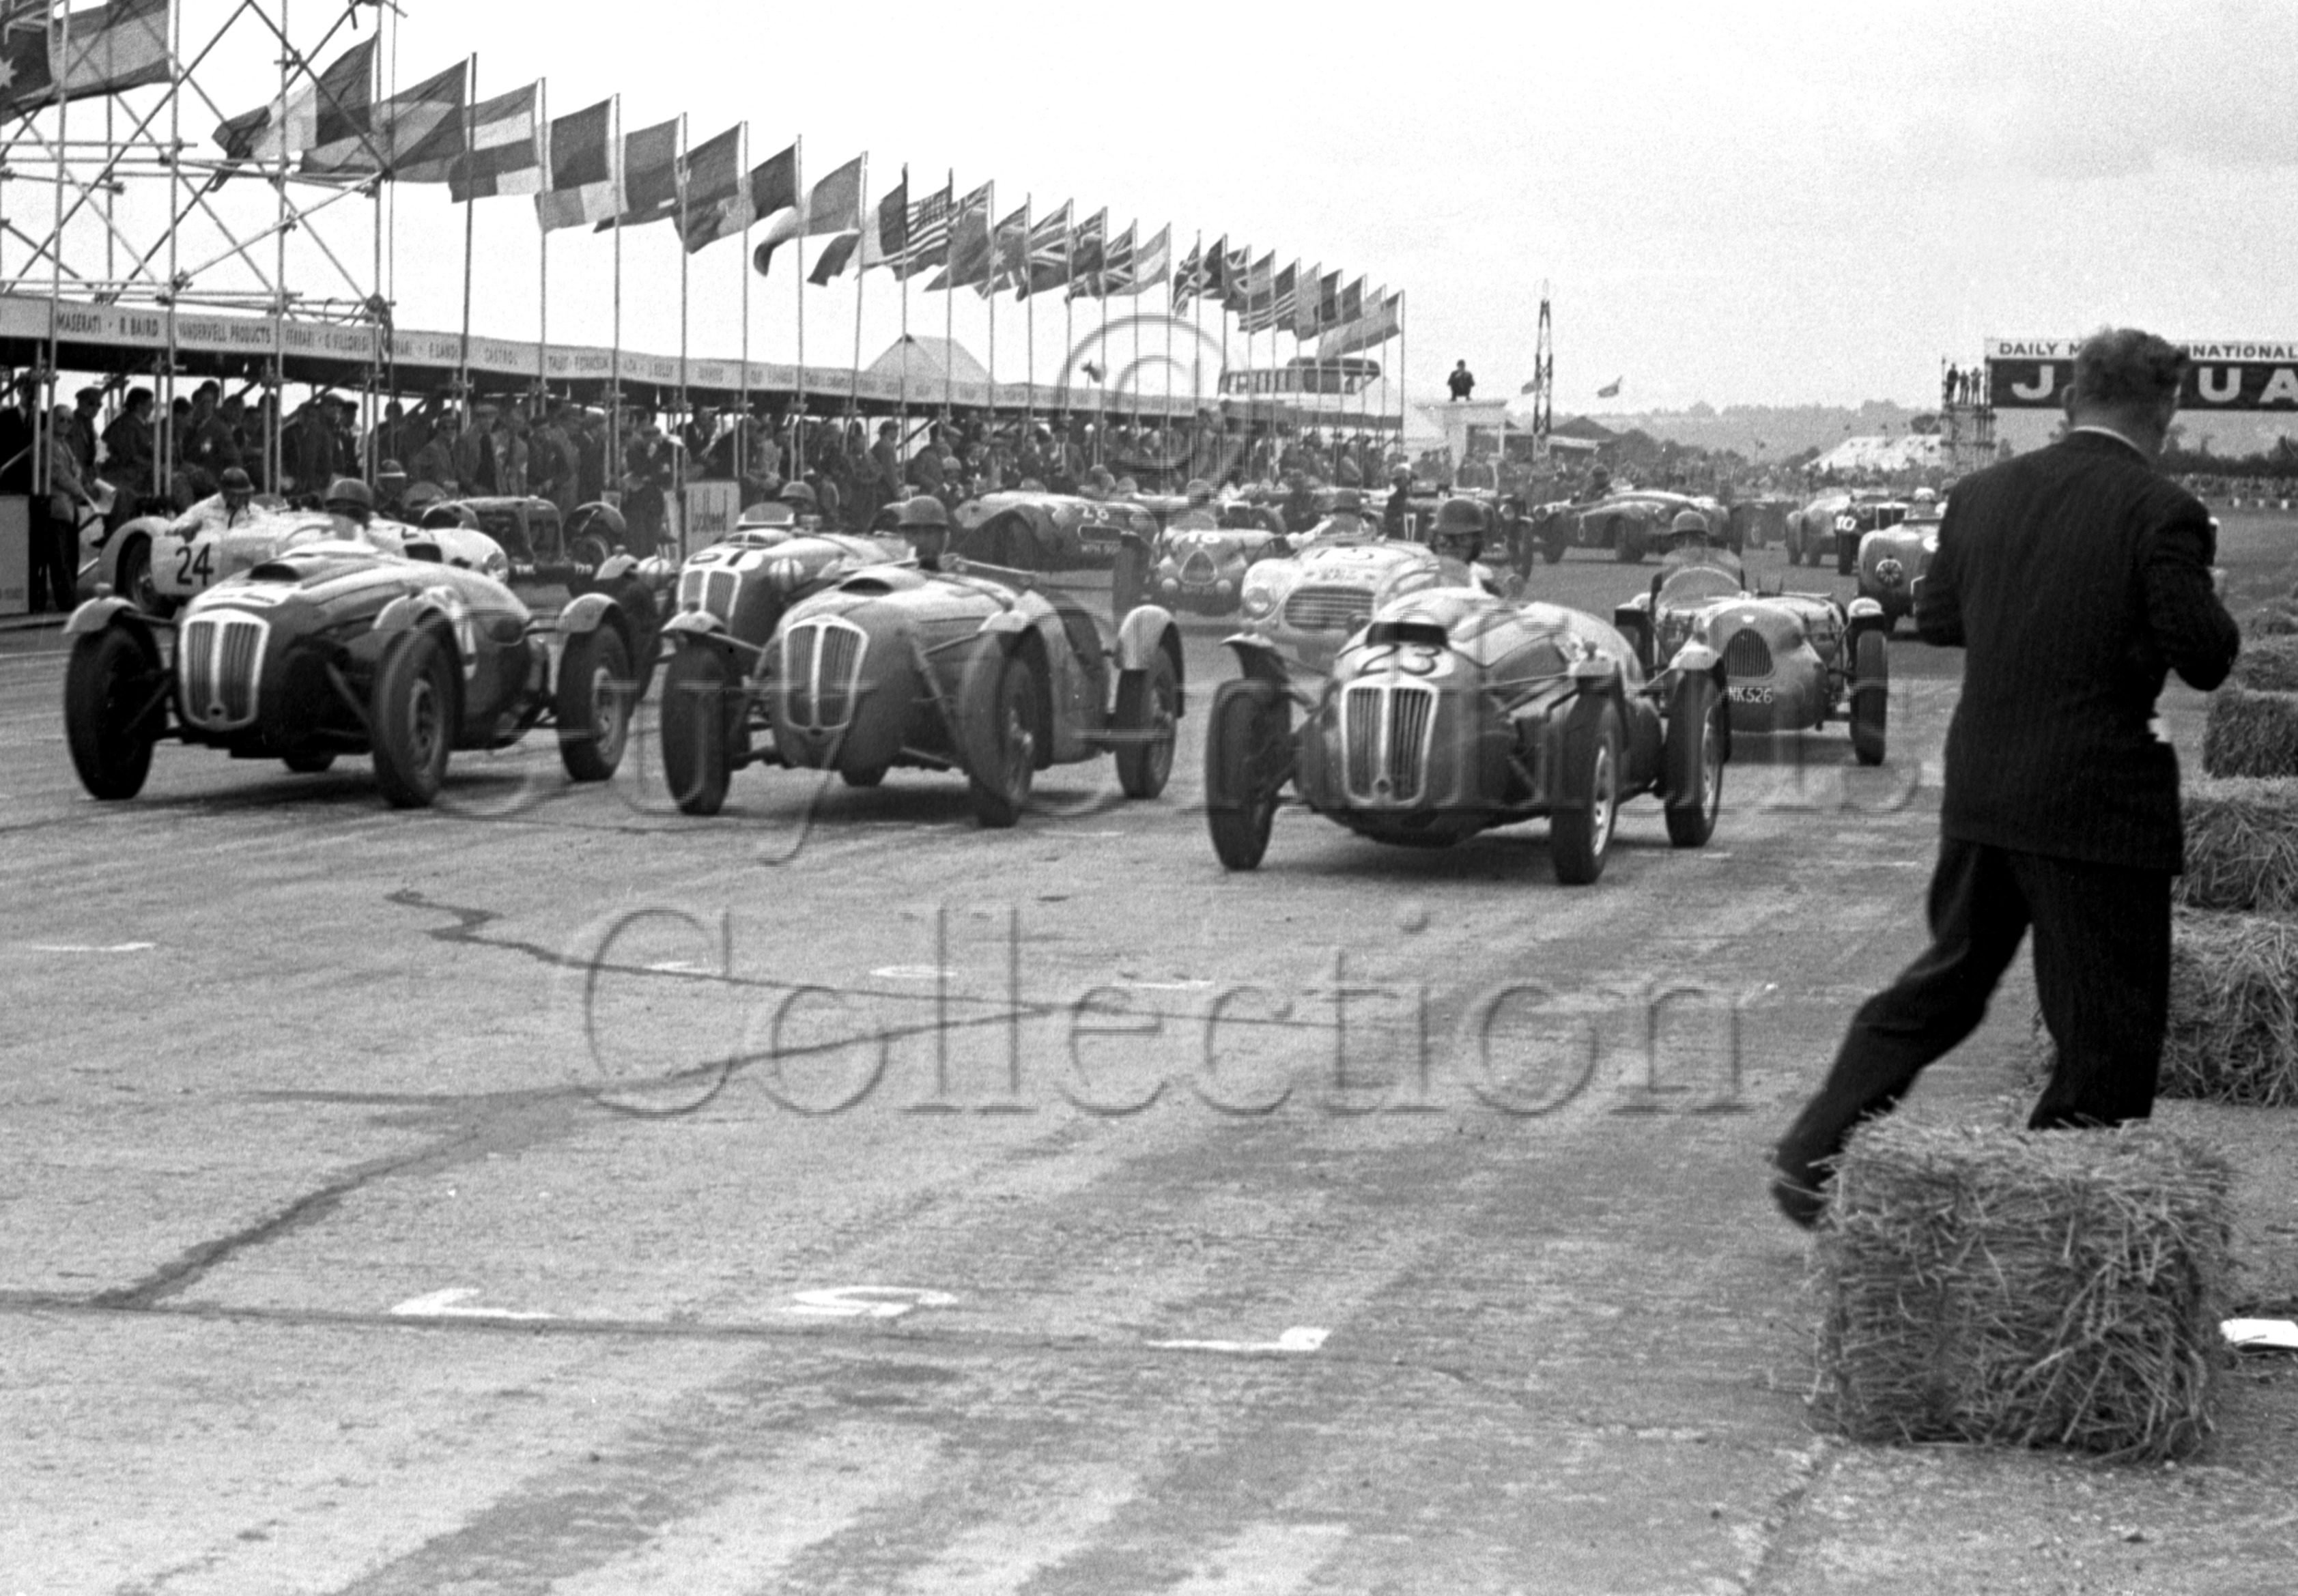 59-163–T-Crook–Frazer-Nash–Boreham–02-08-1952.jpg - The Guy Griffiths Collection